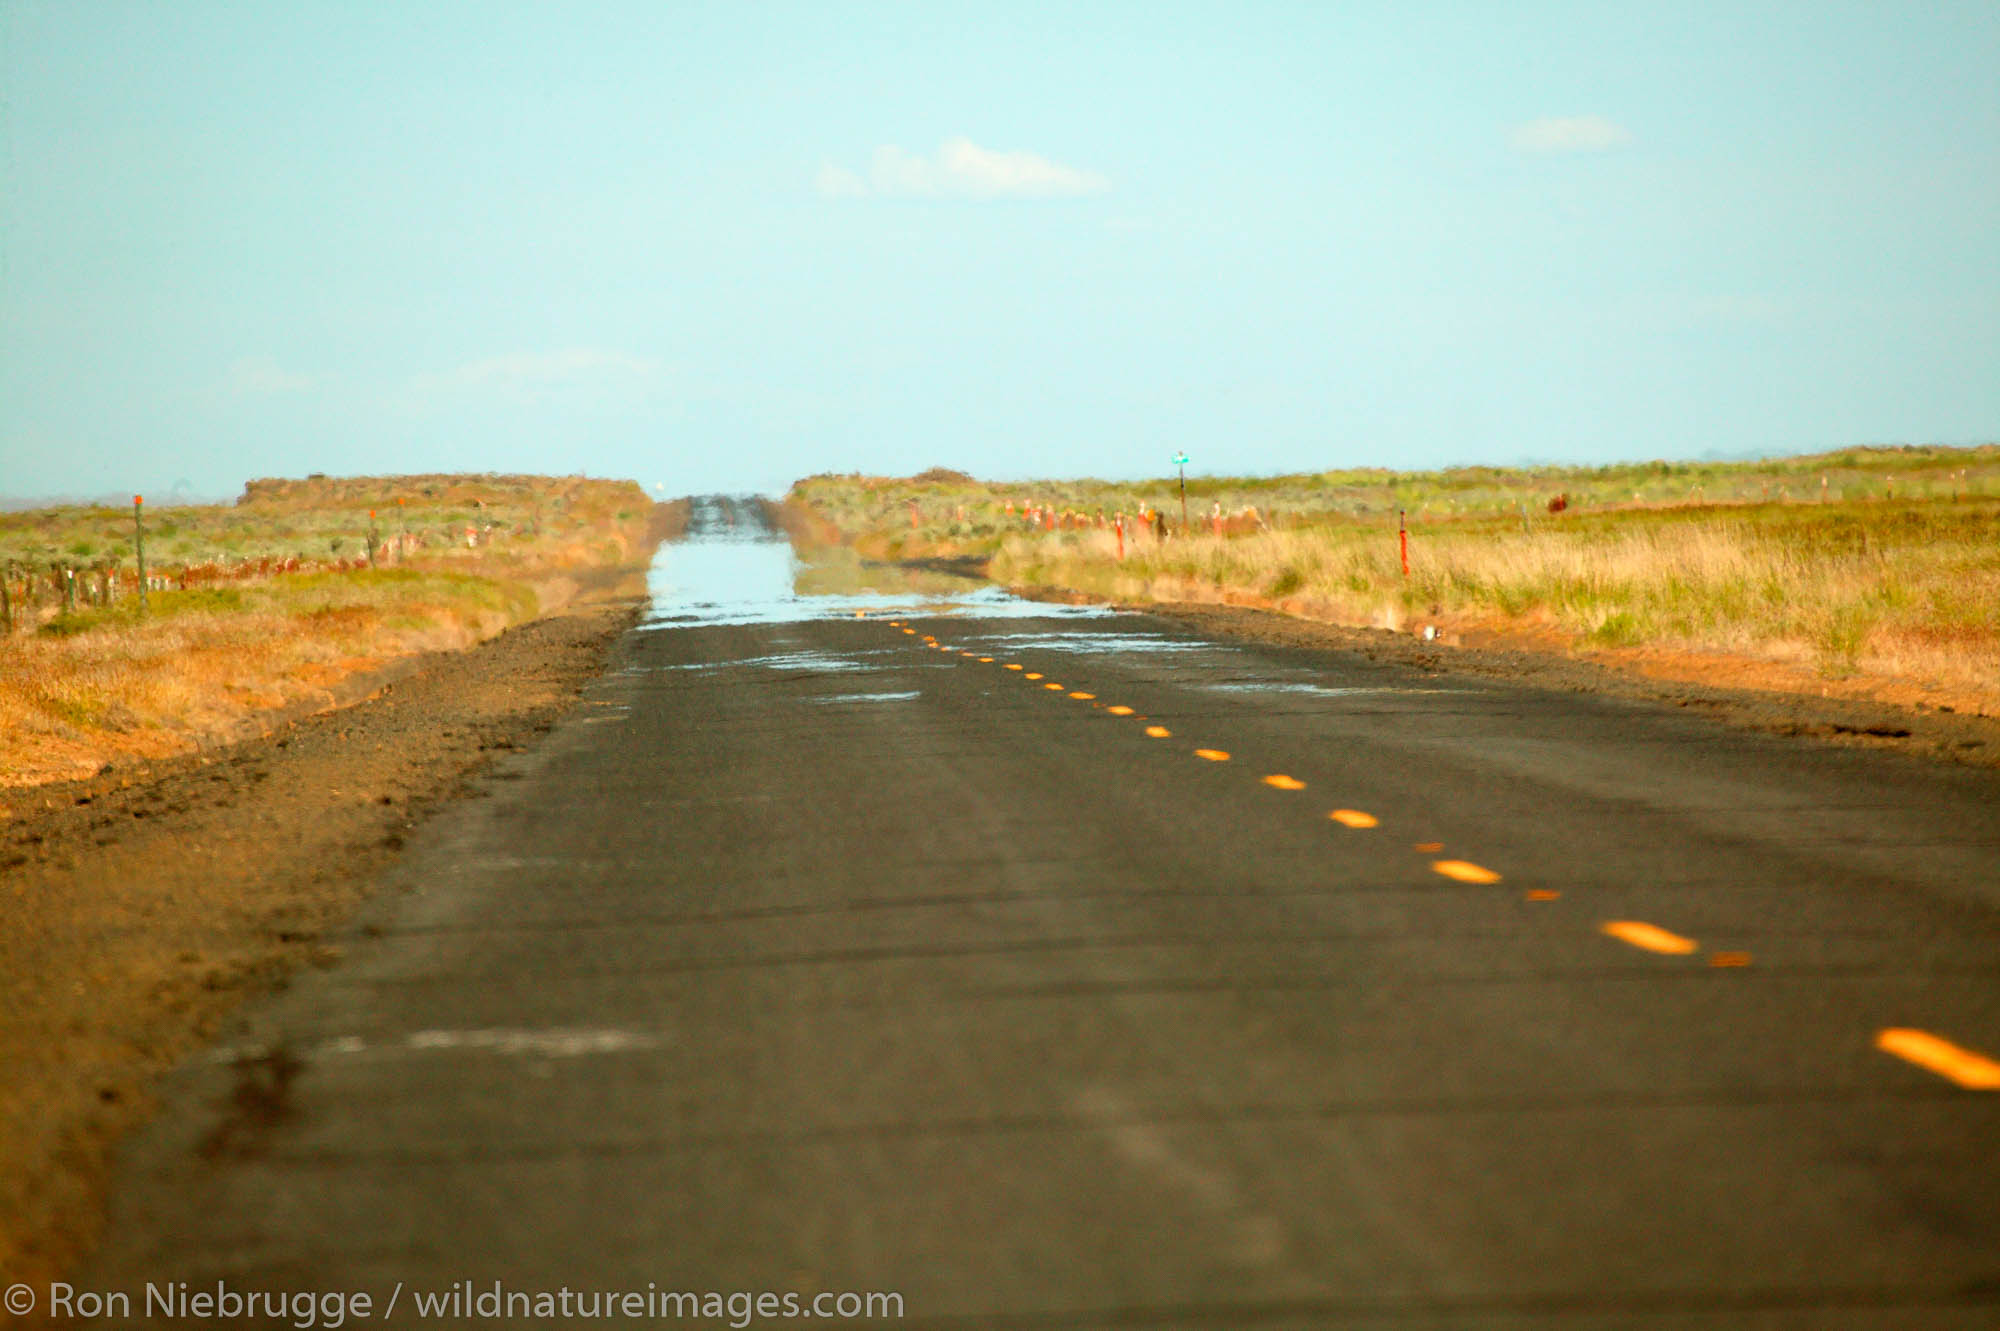 A mirage on a country road along farmland near Ritzville, Eastern Washington.